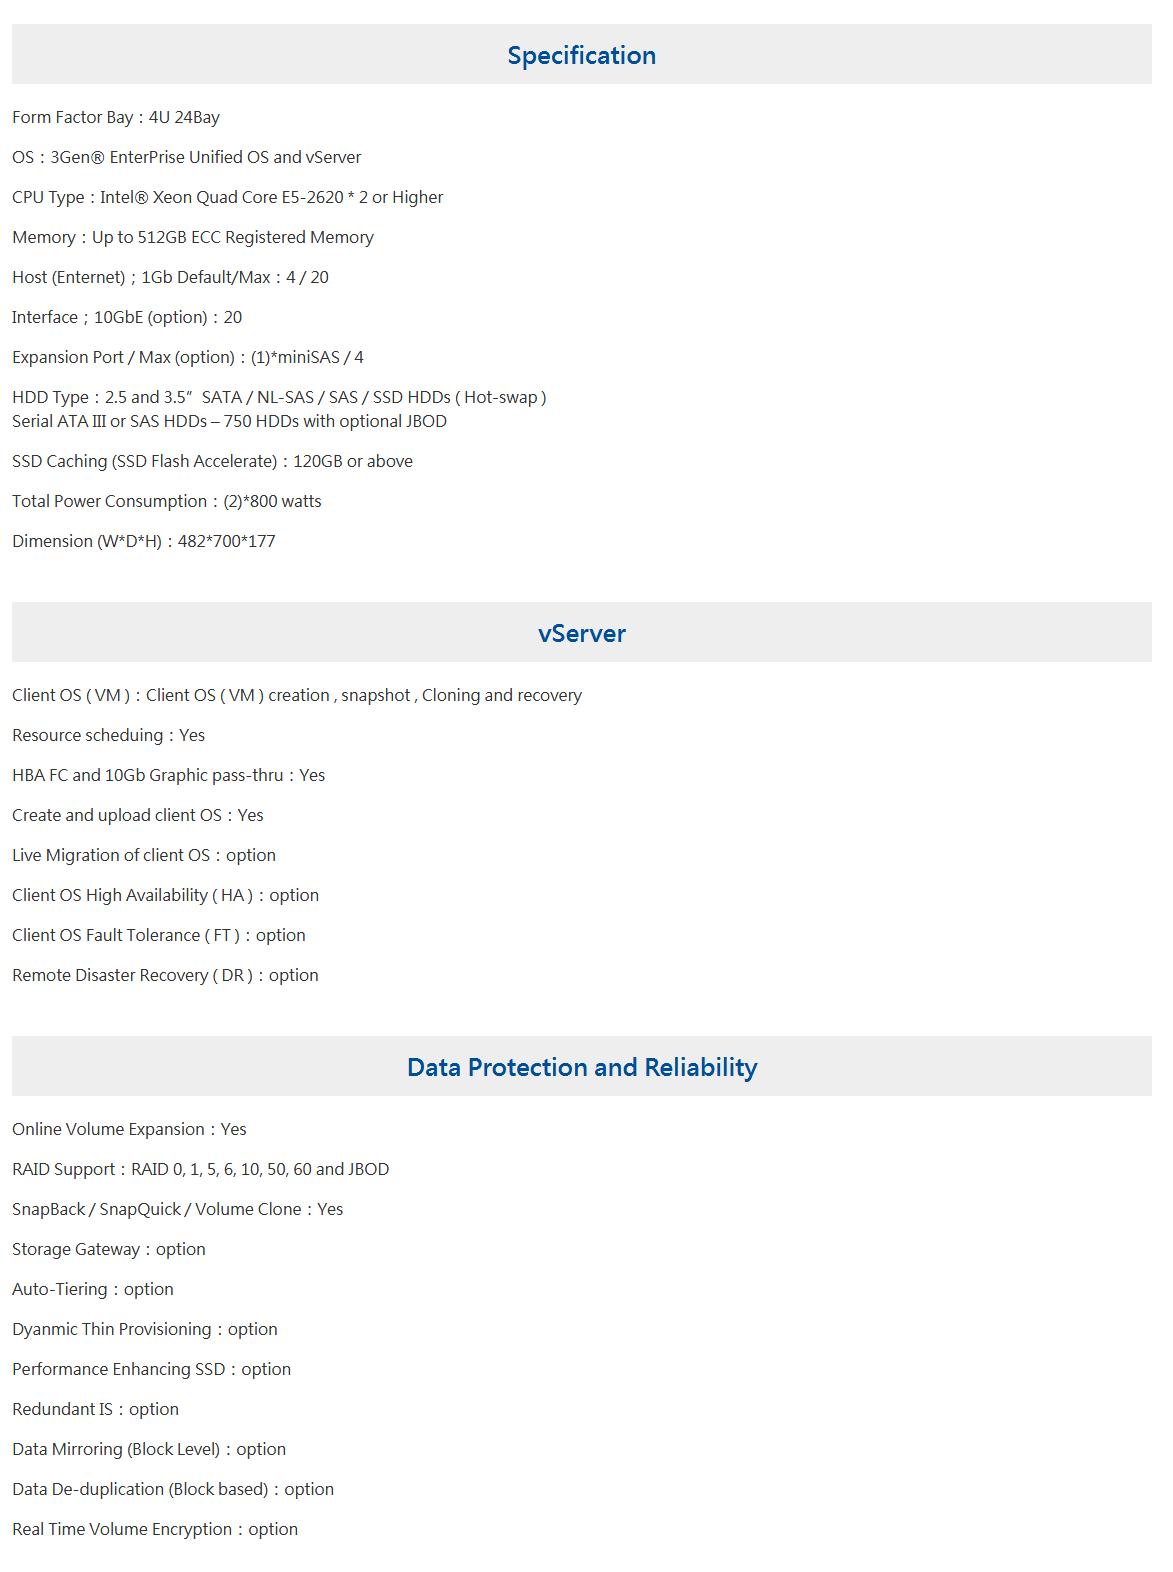 Screenshot_2019-05-16 樂高電腦股份有限公司.png